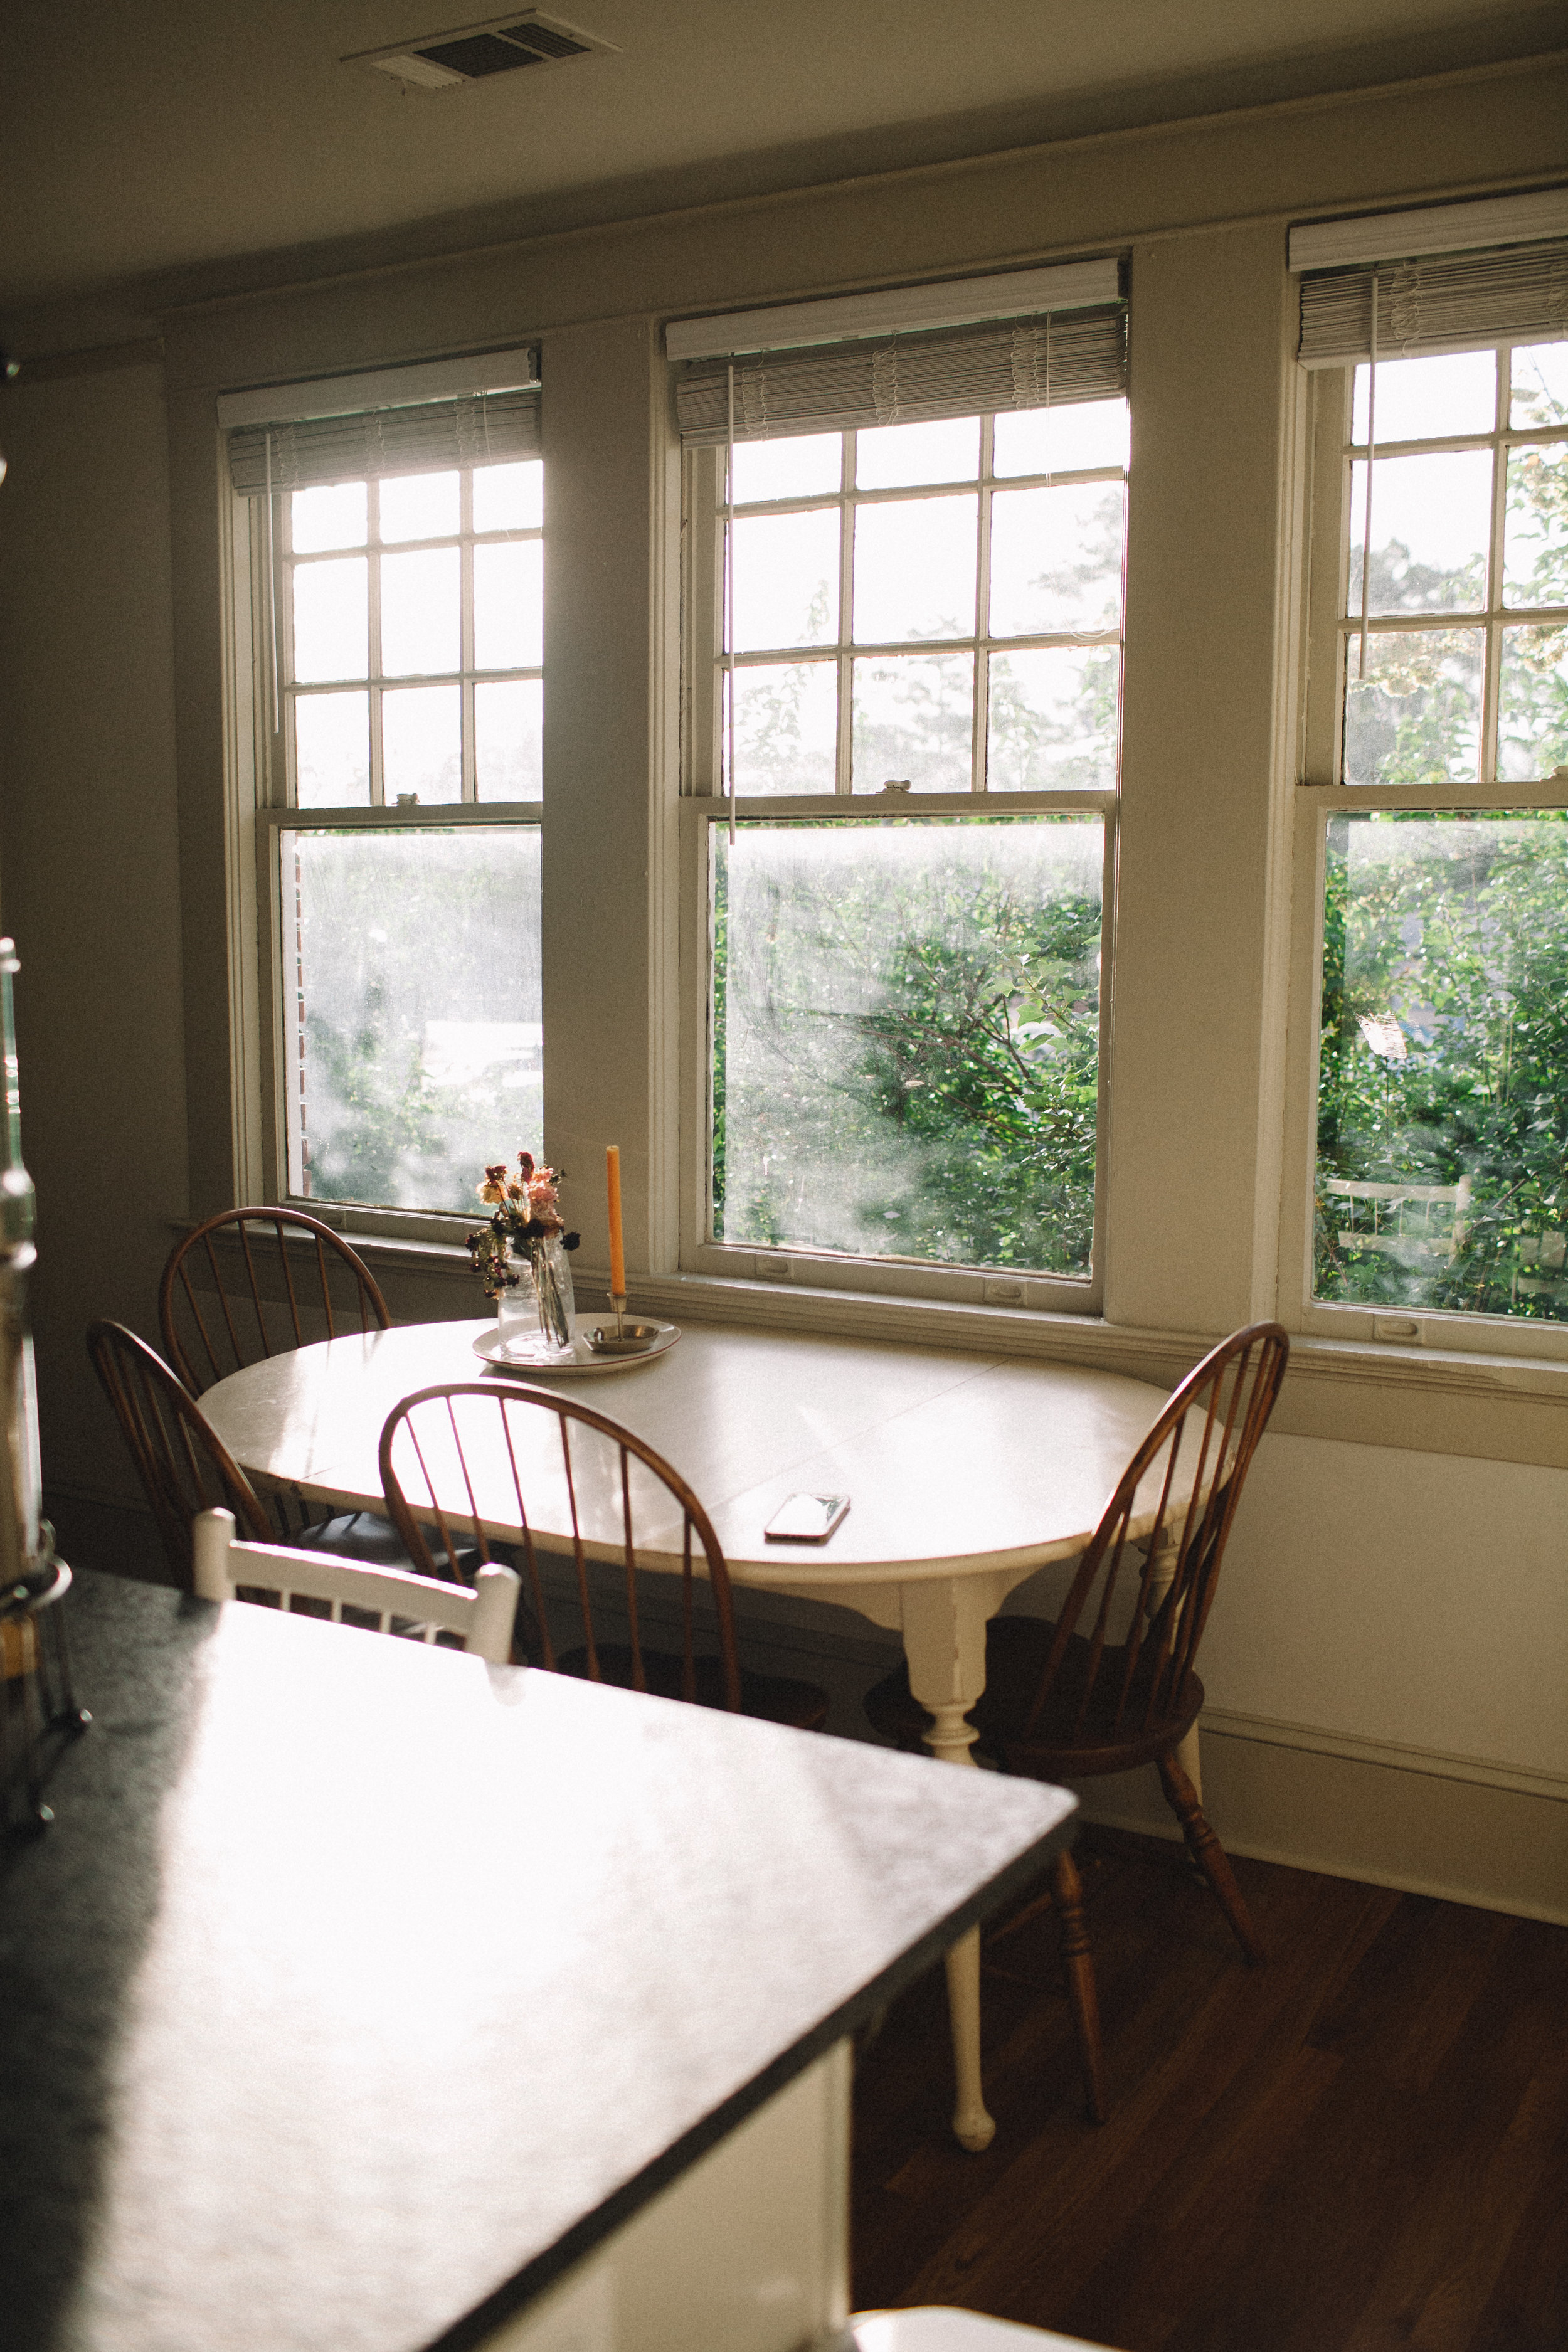 Artichokes-Kitchen_7-15-19-24.jpg